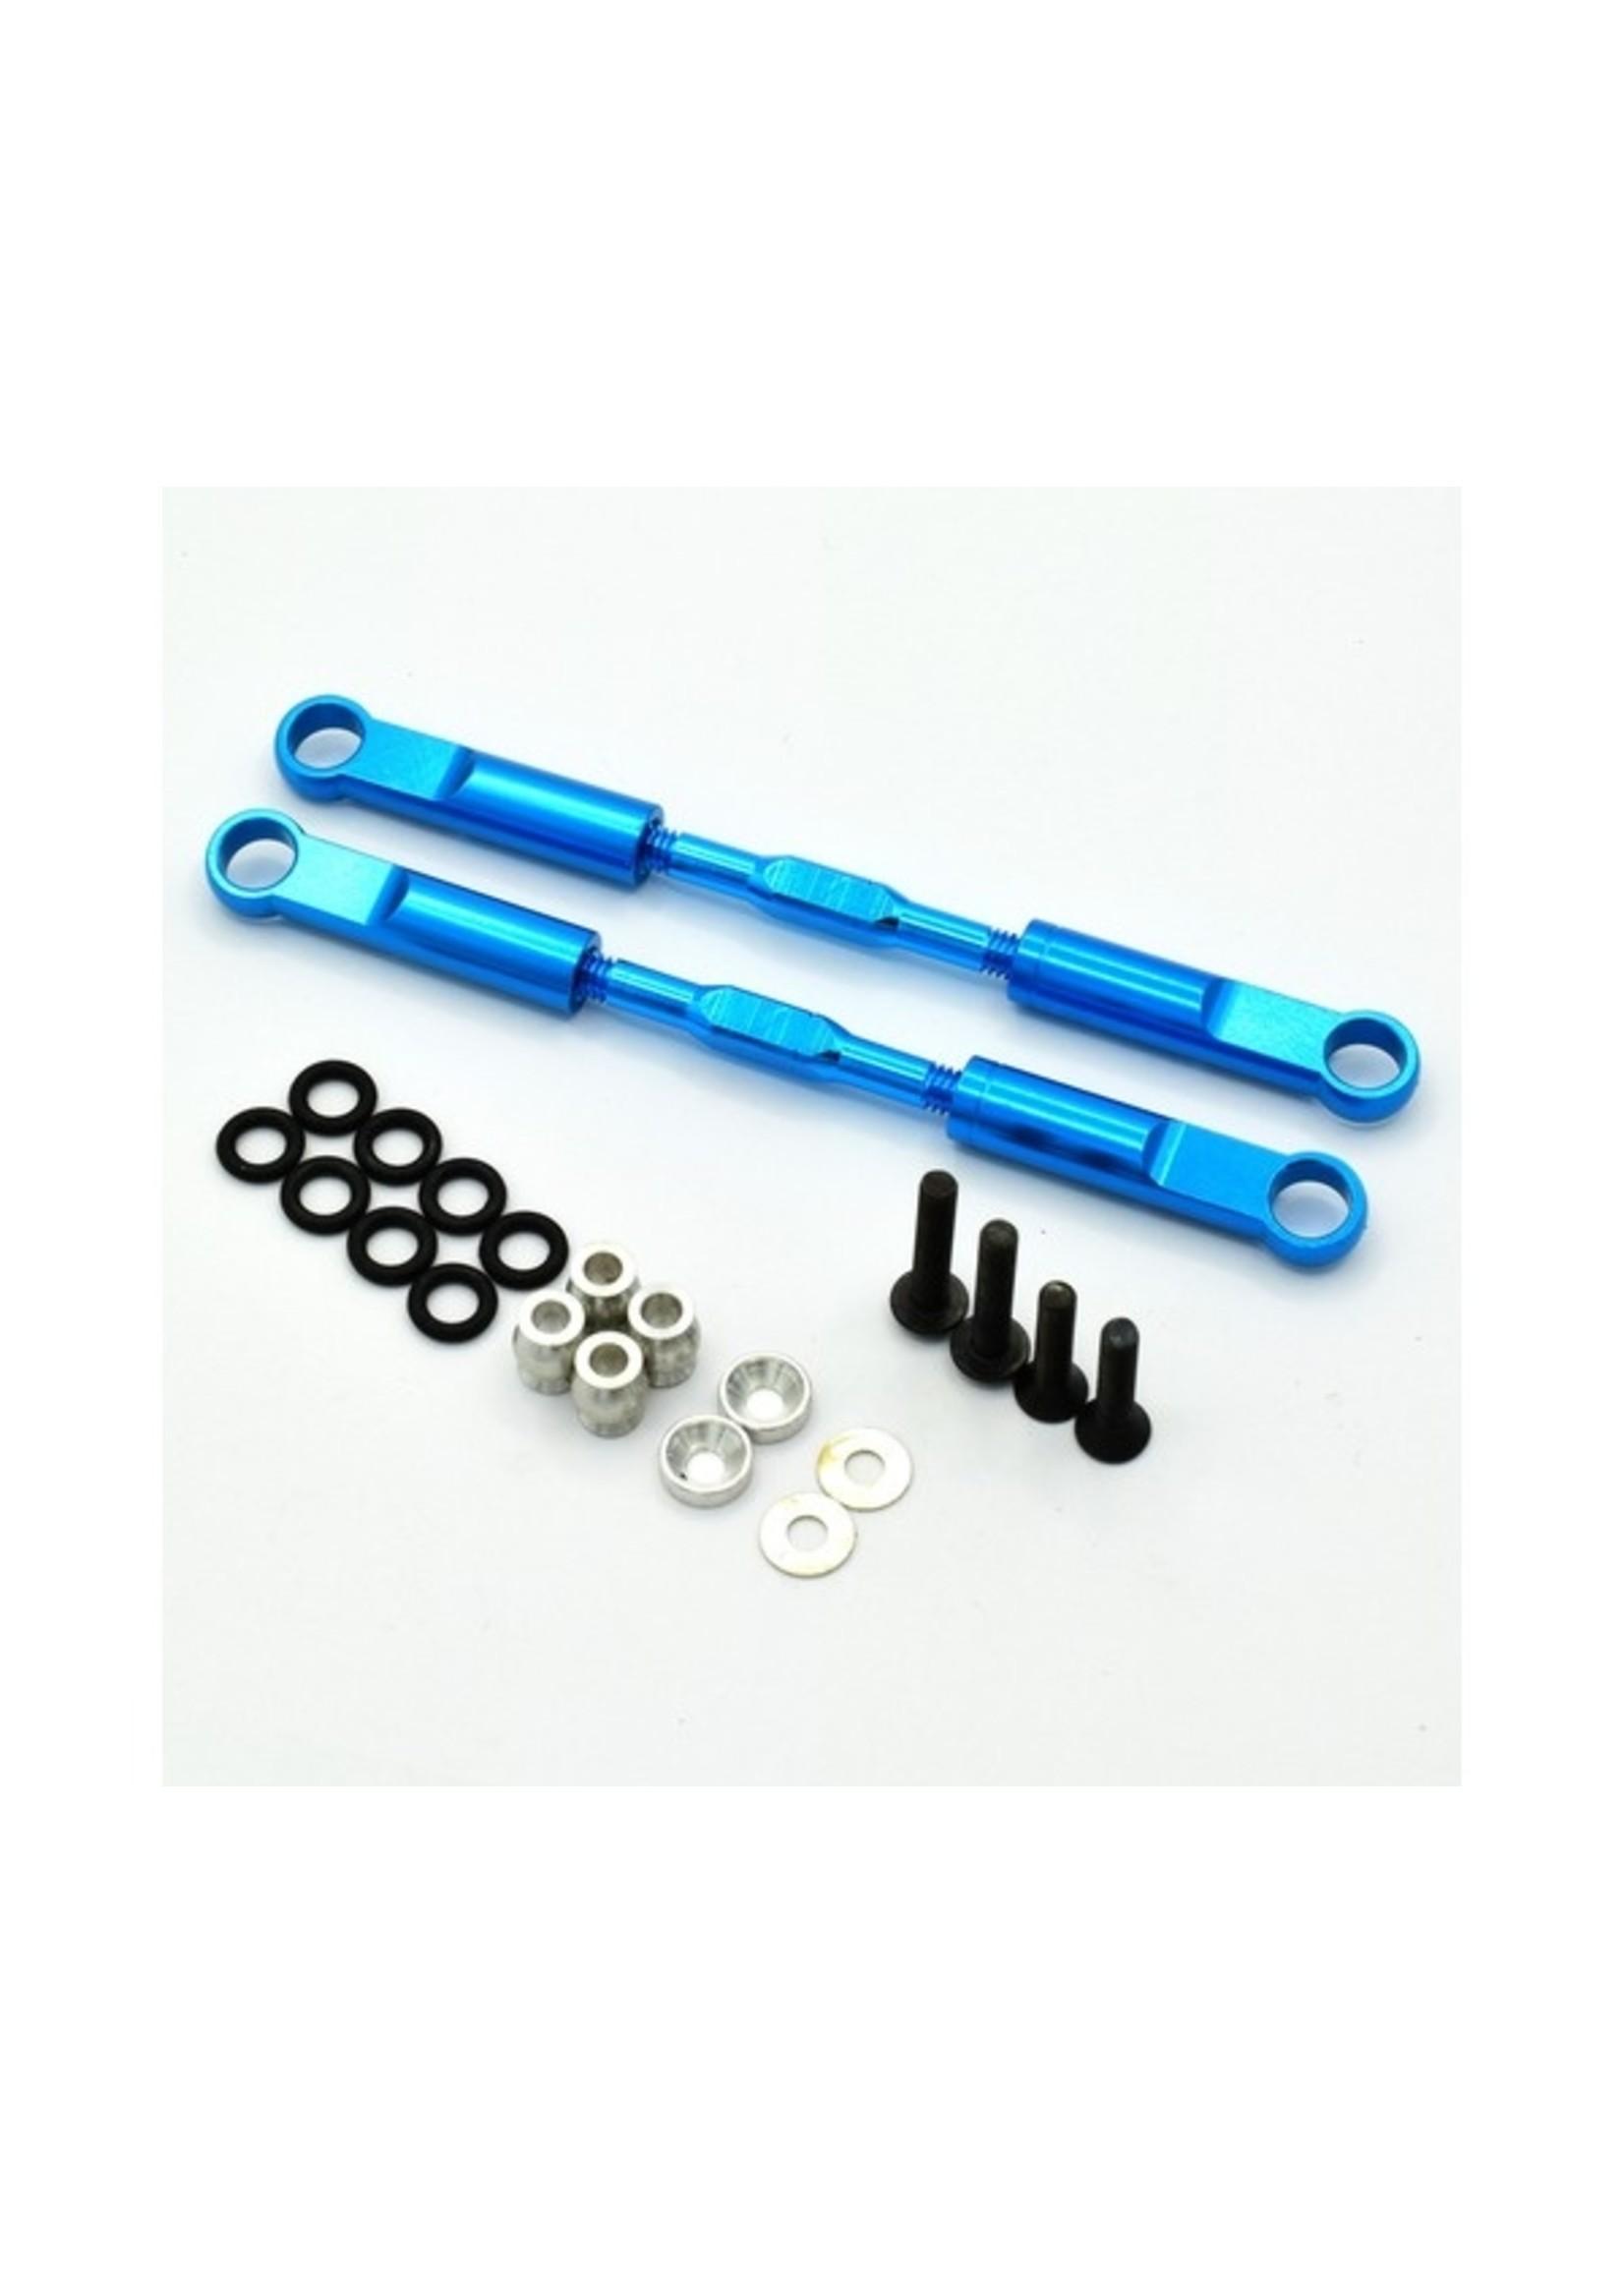 Hot Racing HRAECT5706 Hot Racing Blue Aluminum 89mm Rear Turnbuckles